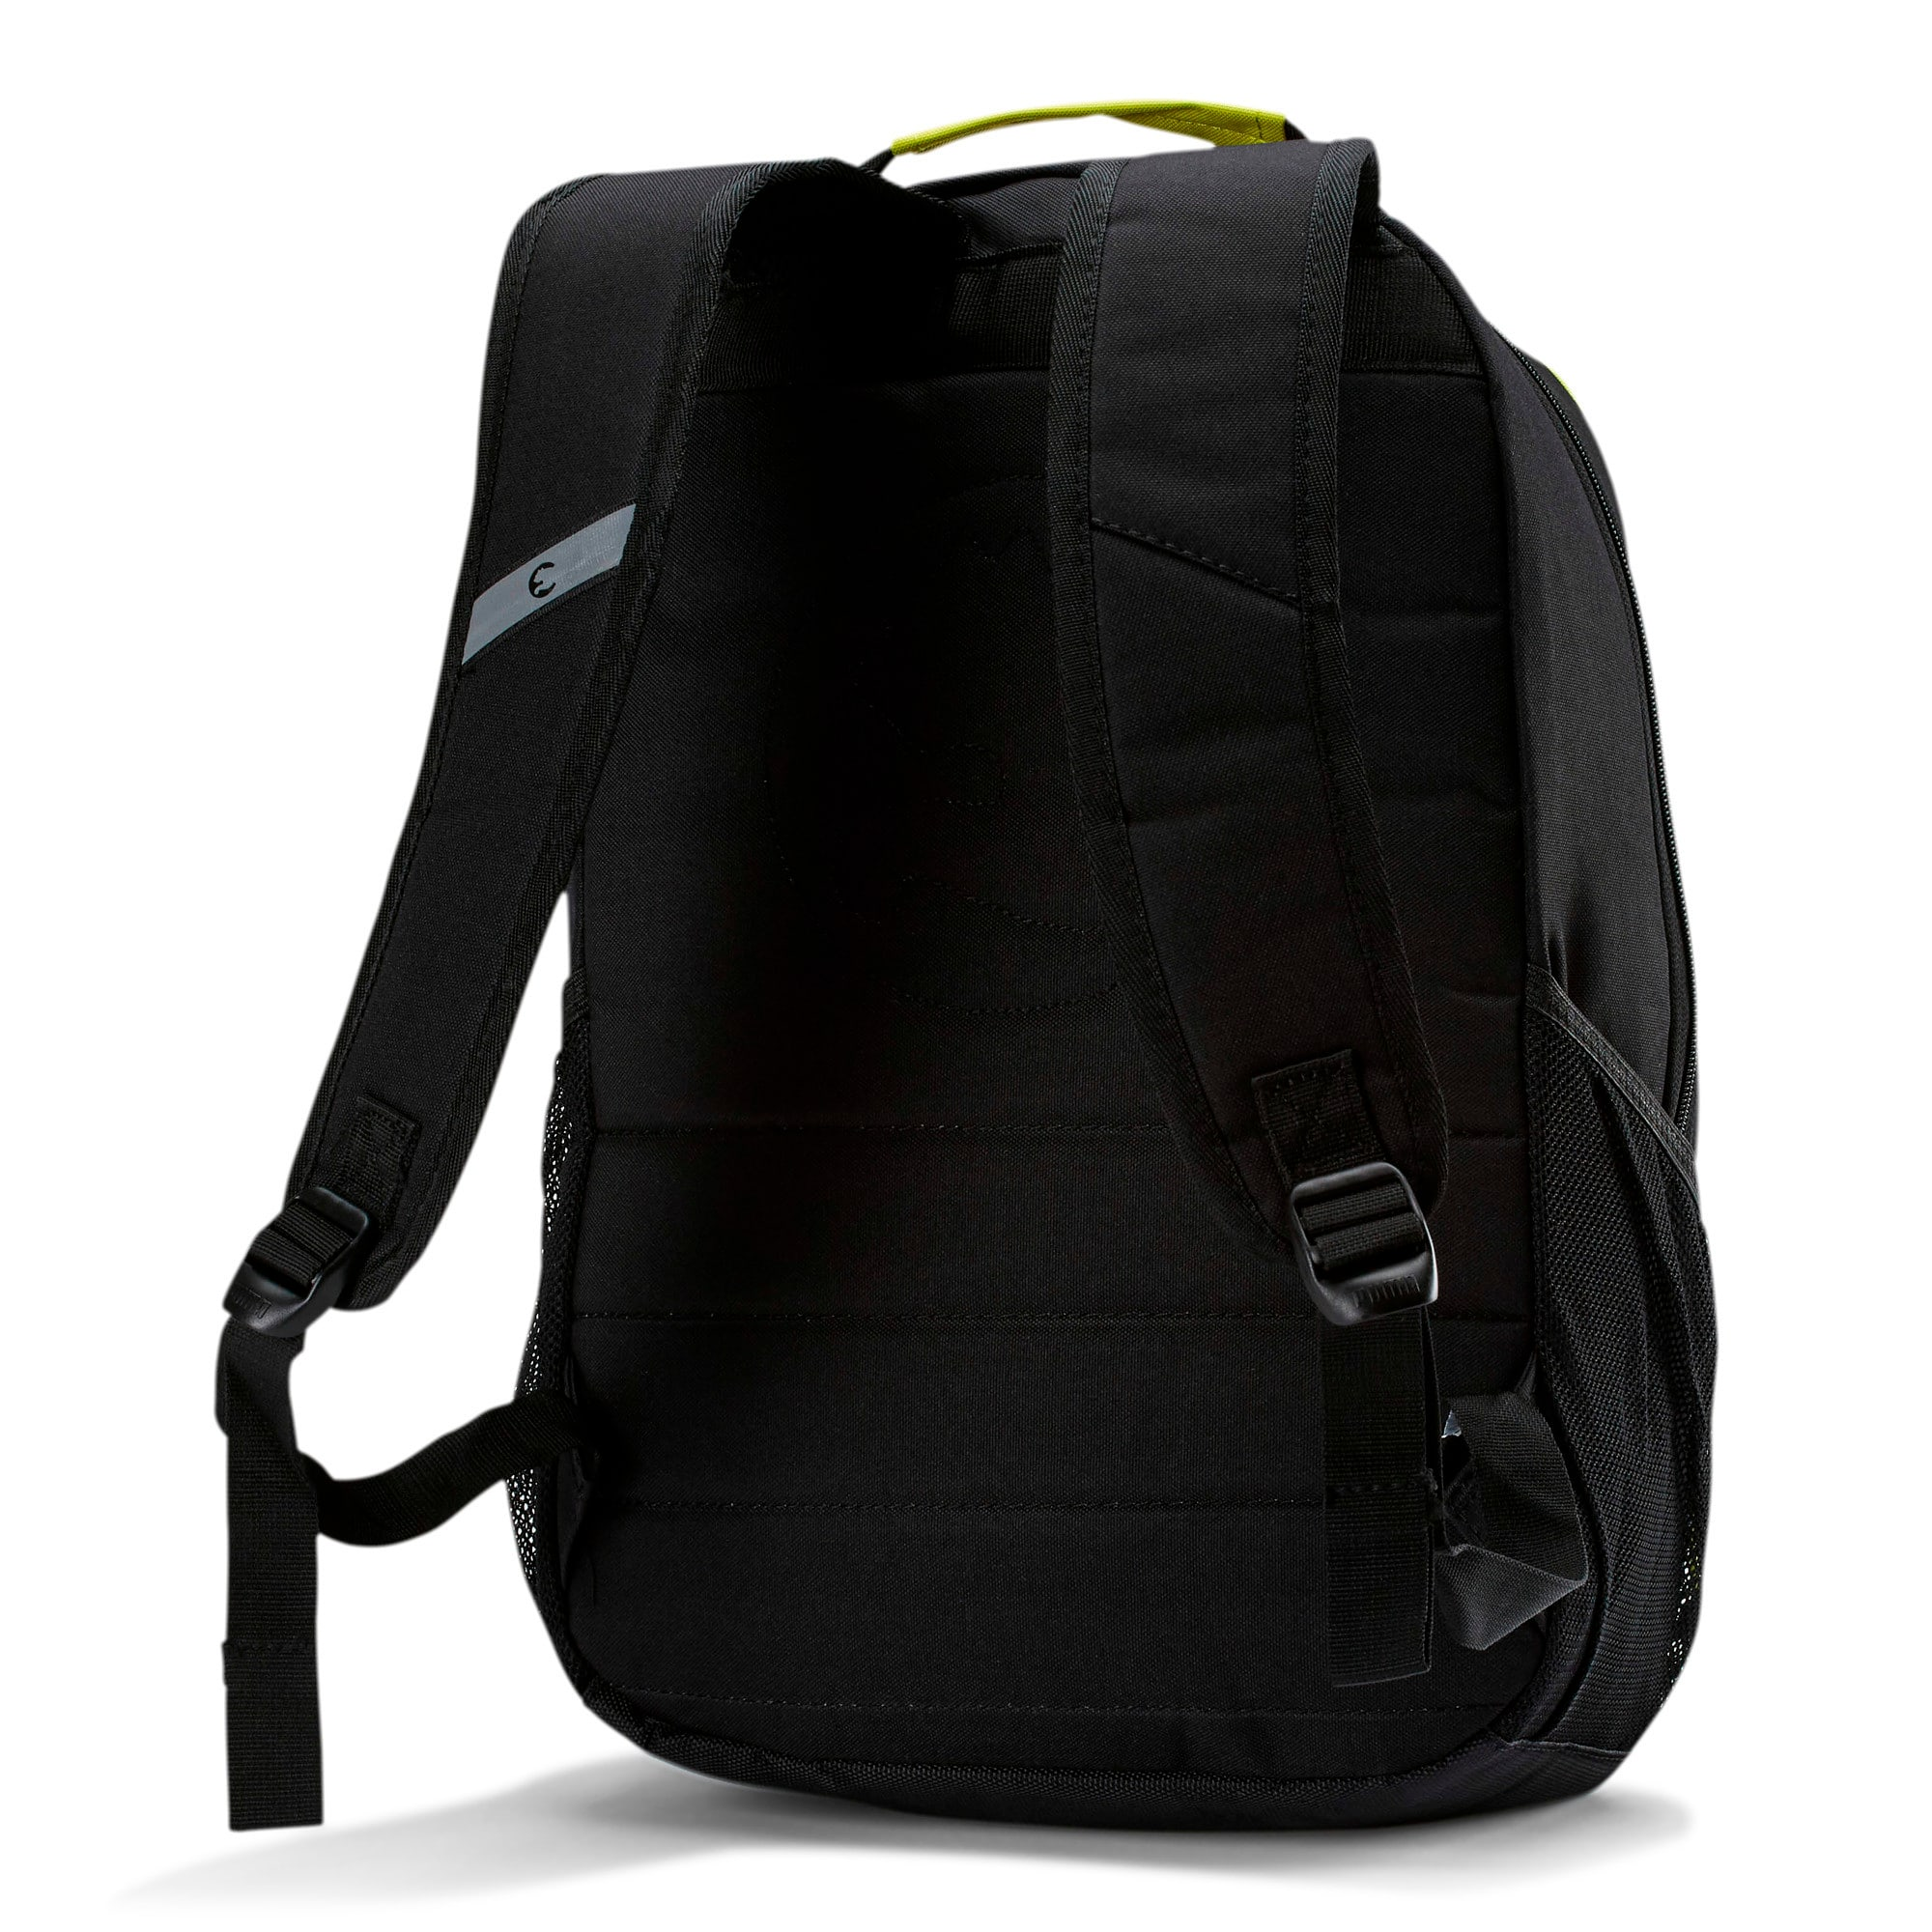 Thumbnail 2 of ProCat Game Day Backpack, BLACK, medium